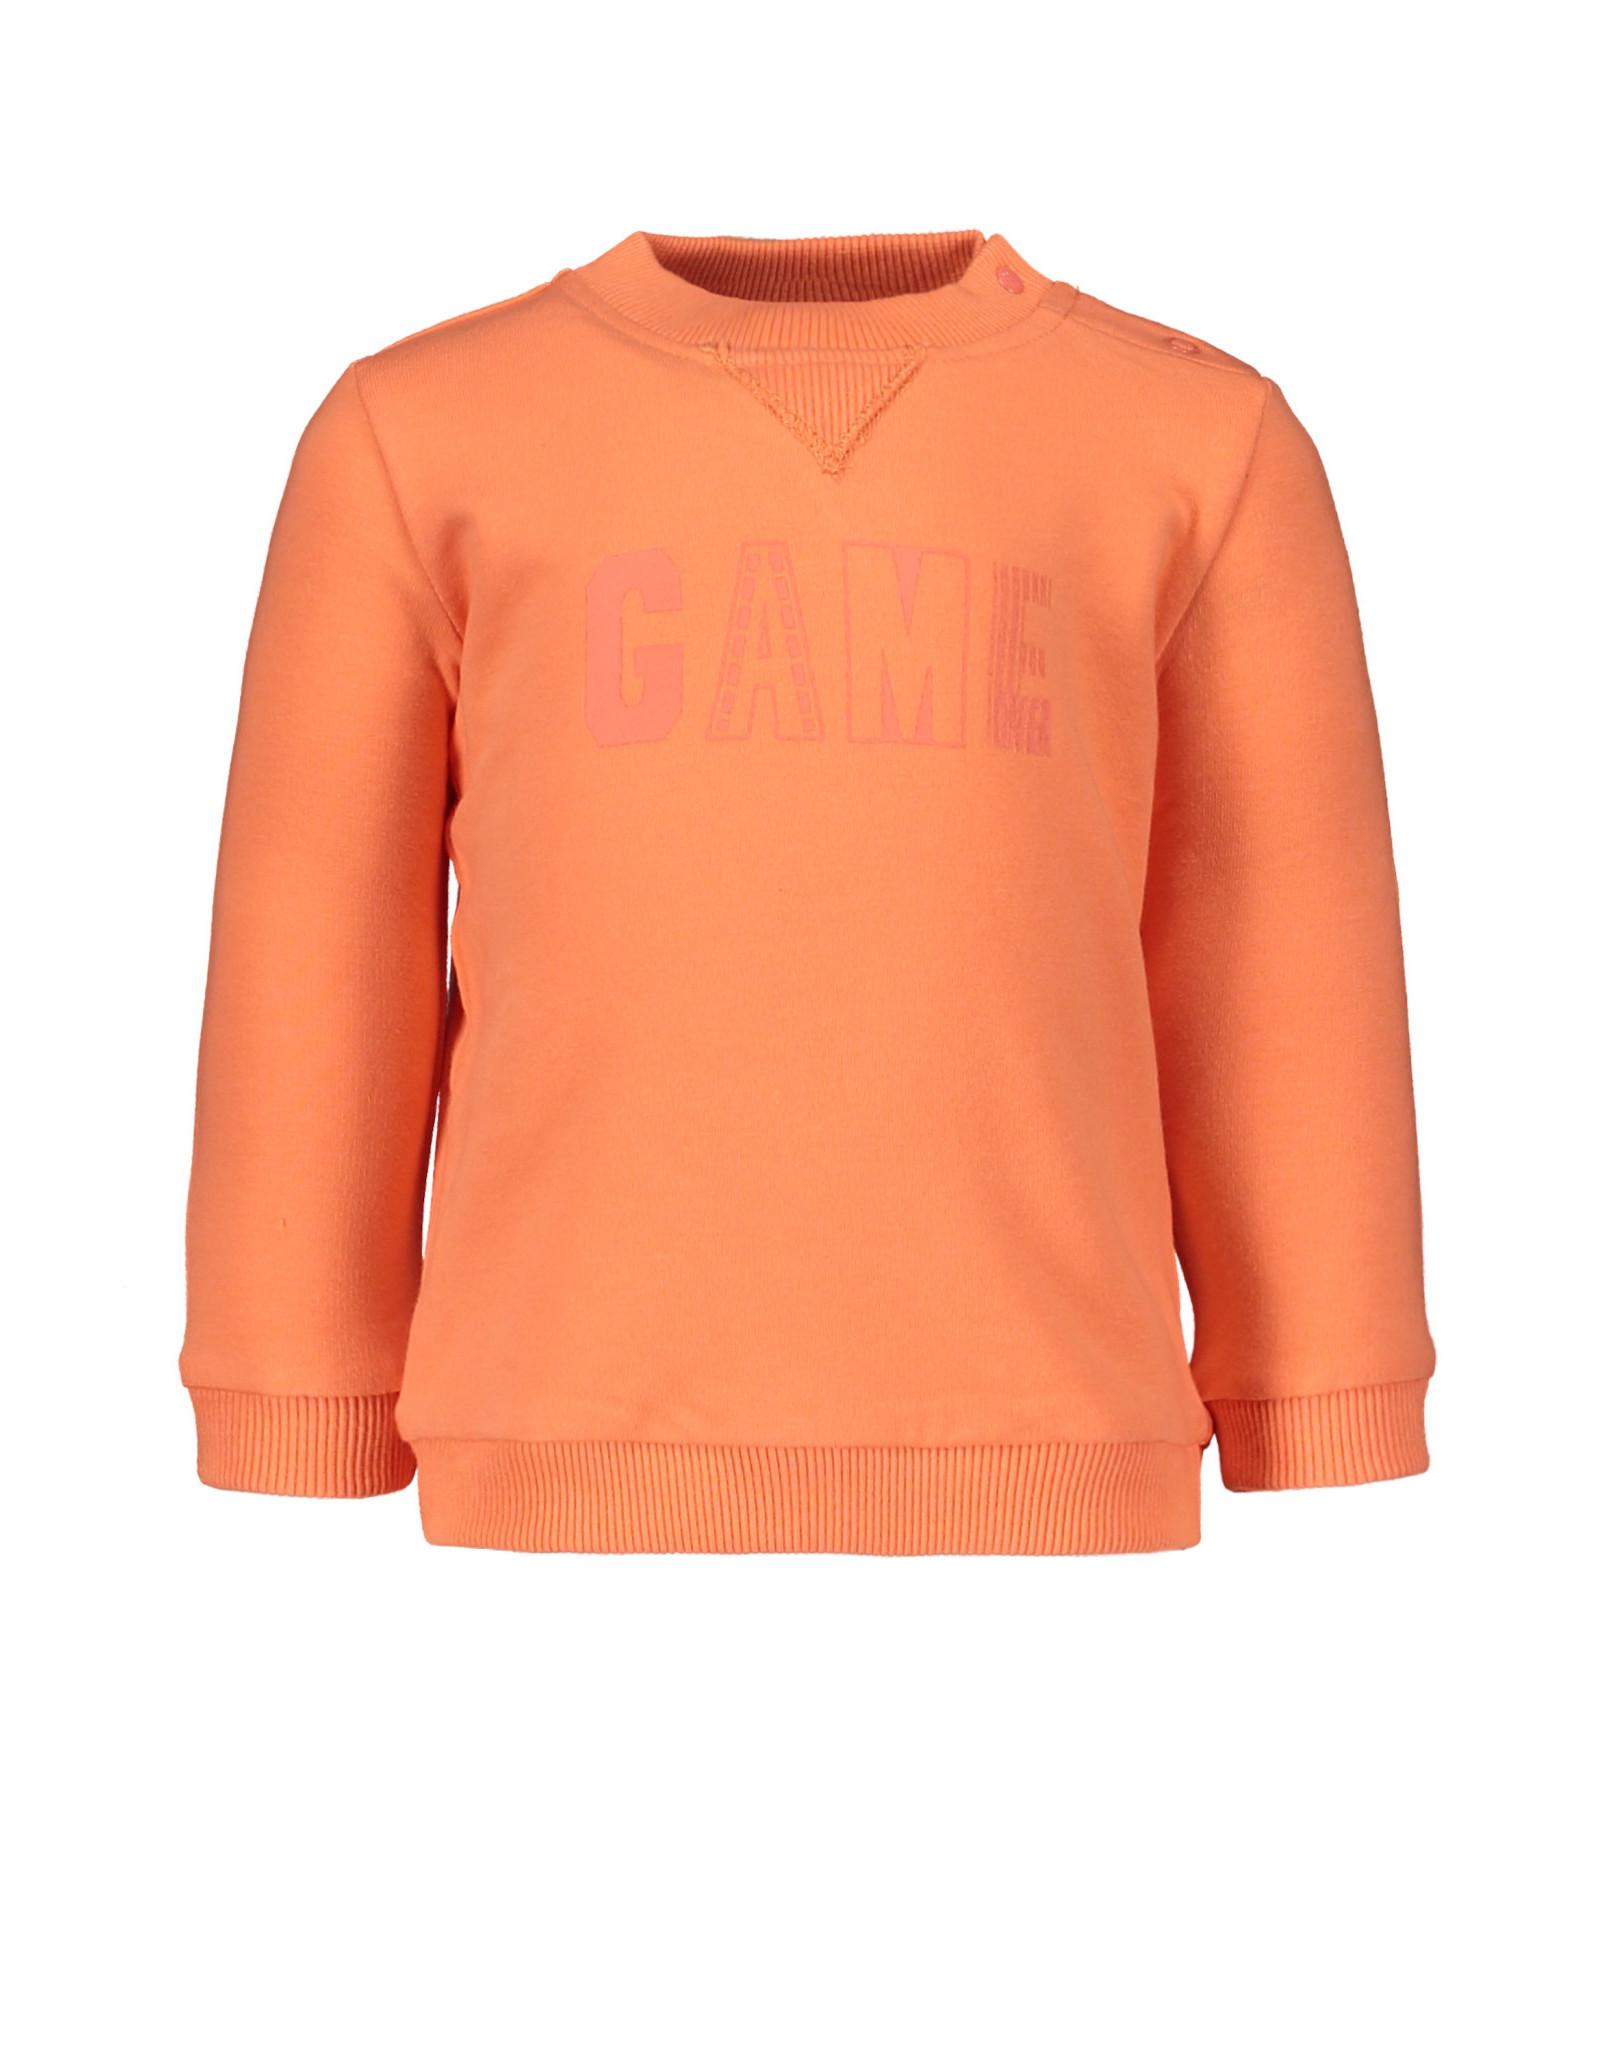 Bampidano Bampidano baby jongens sweater Dyan Coral